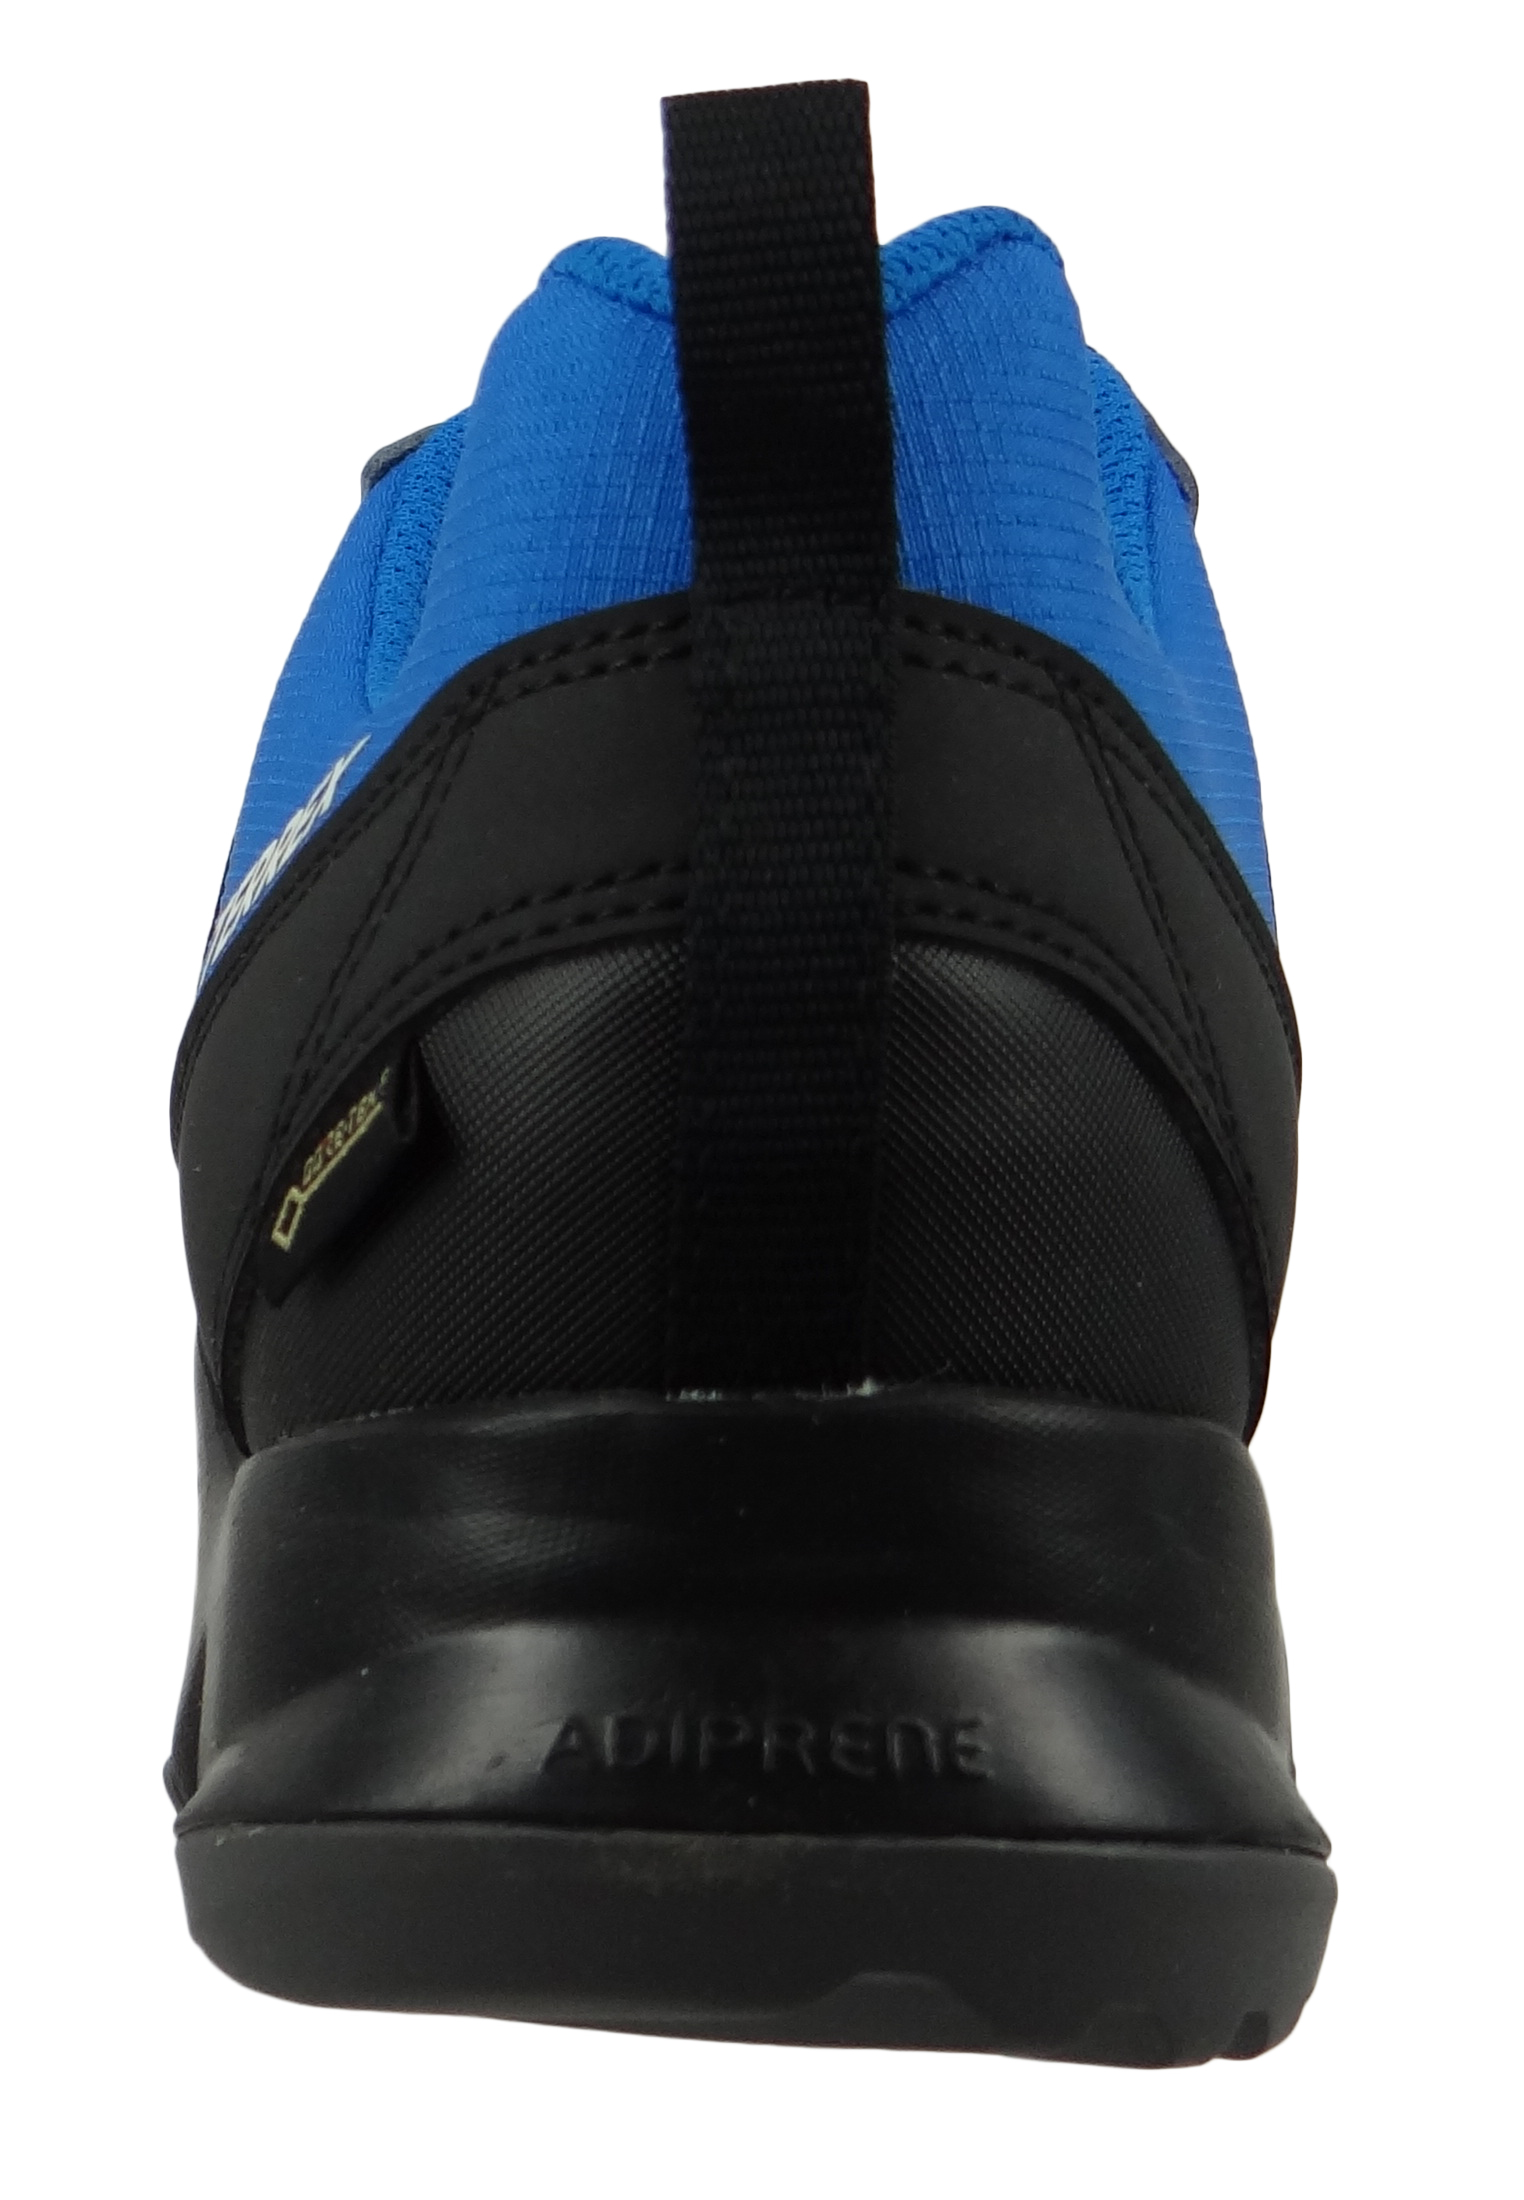 43941044f91bf8 adidas TERREX AX2R GTX AC8032 Herren Hiking Outdoorschuhe Core Black Core  Black Blue Beauty